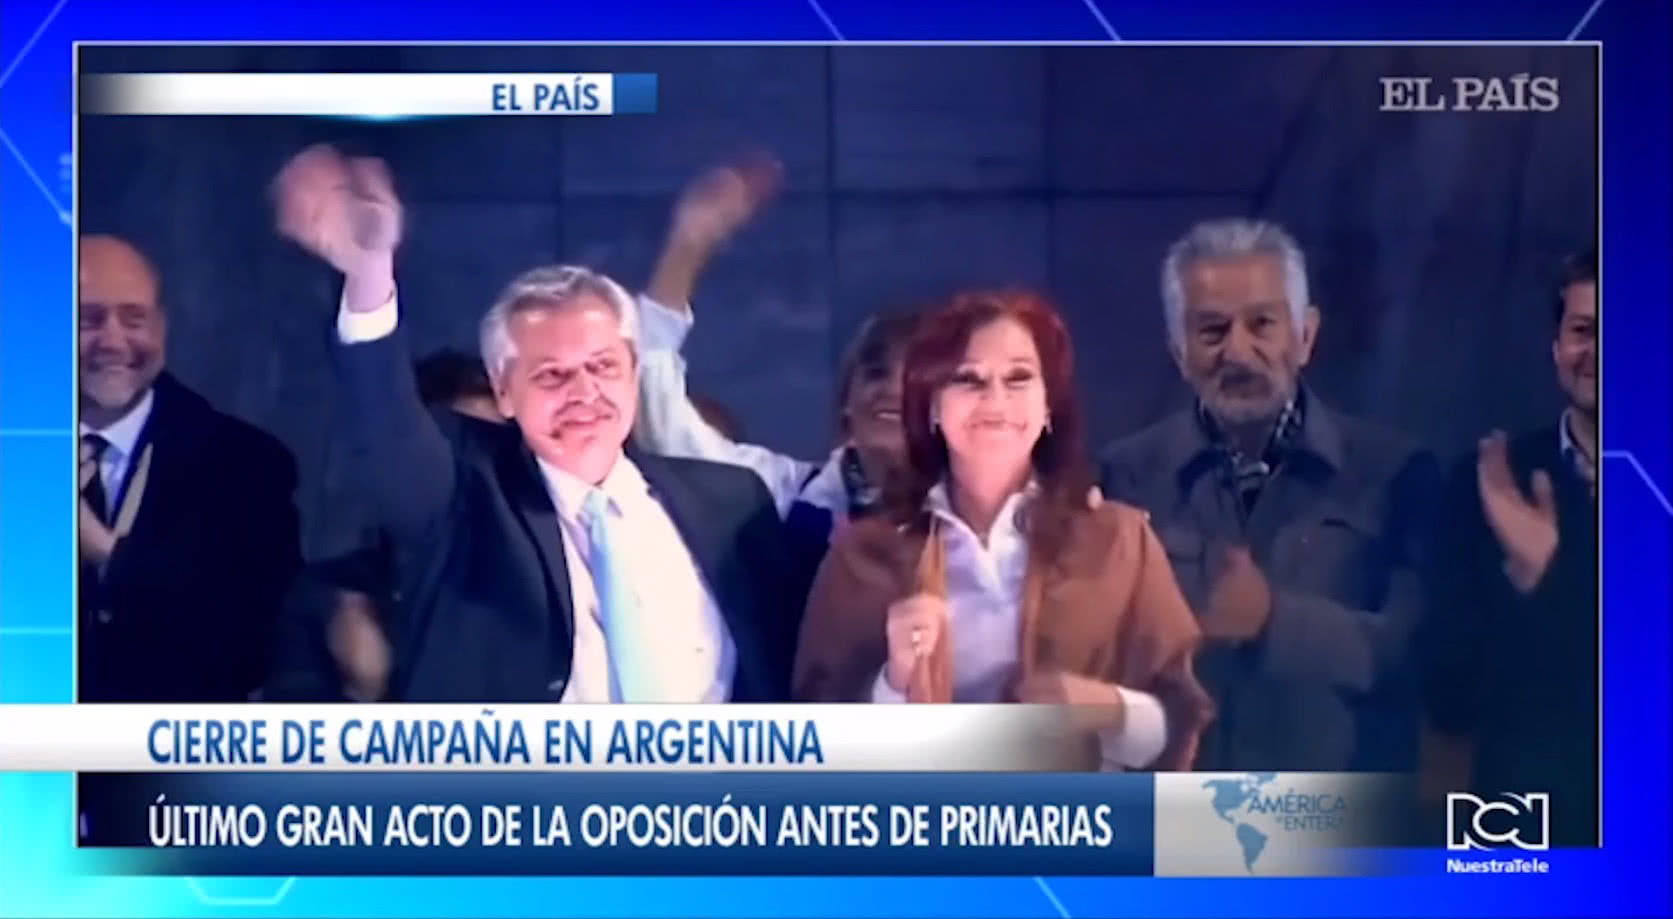 Kirchnerismo cierra campaña con un acto de reconciliación